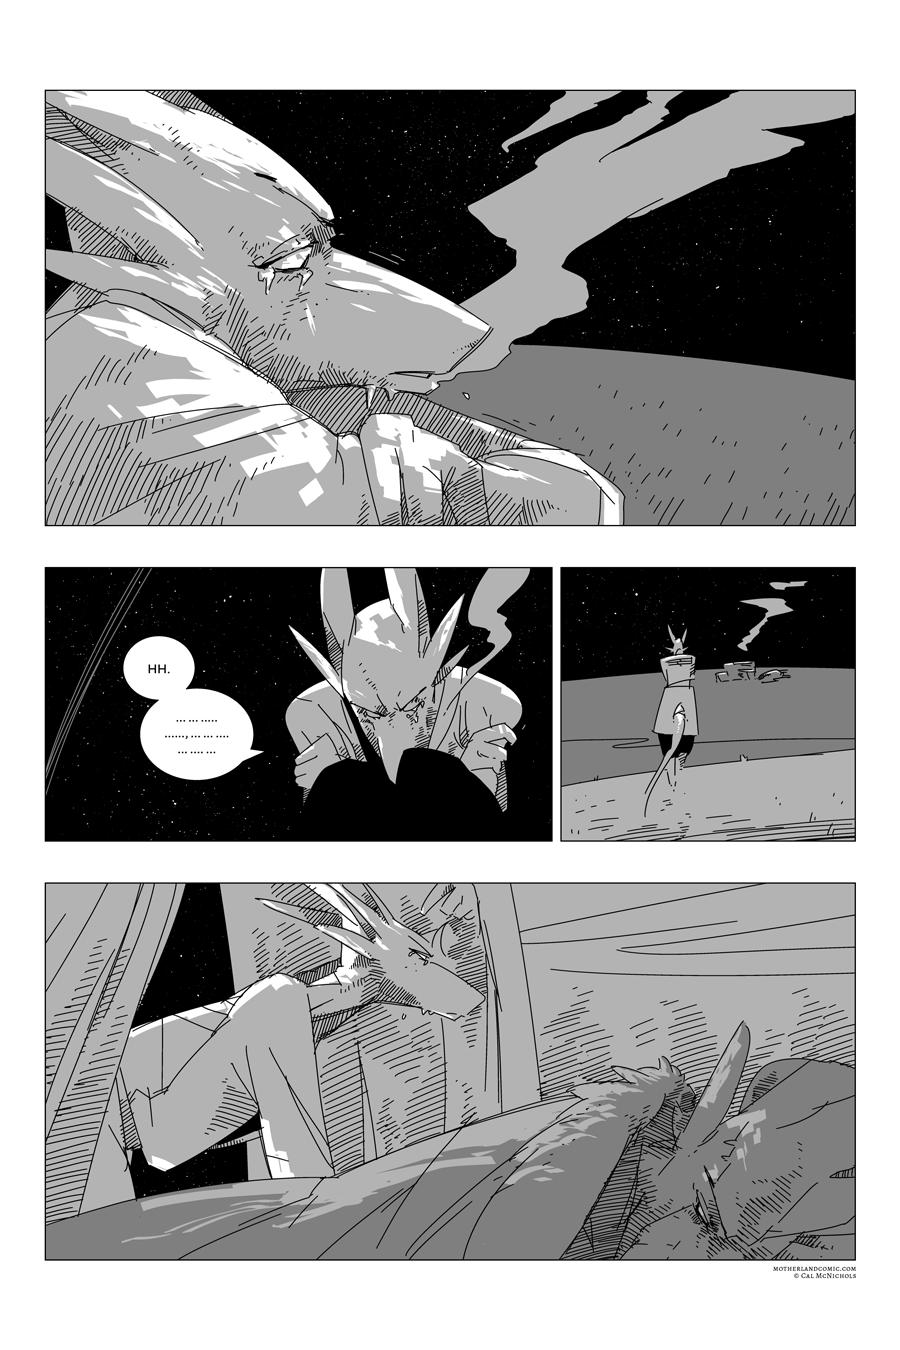 pg 80